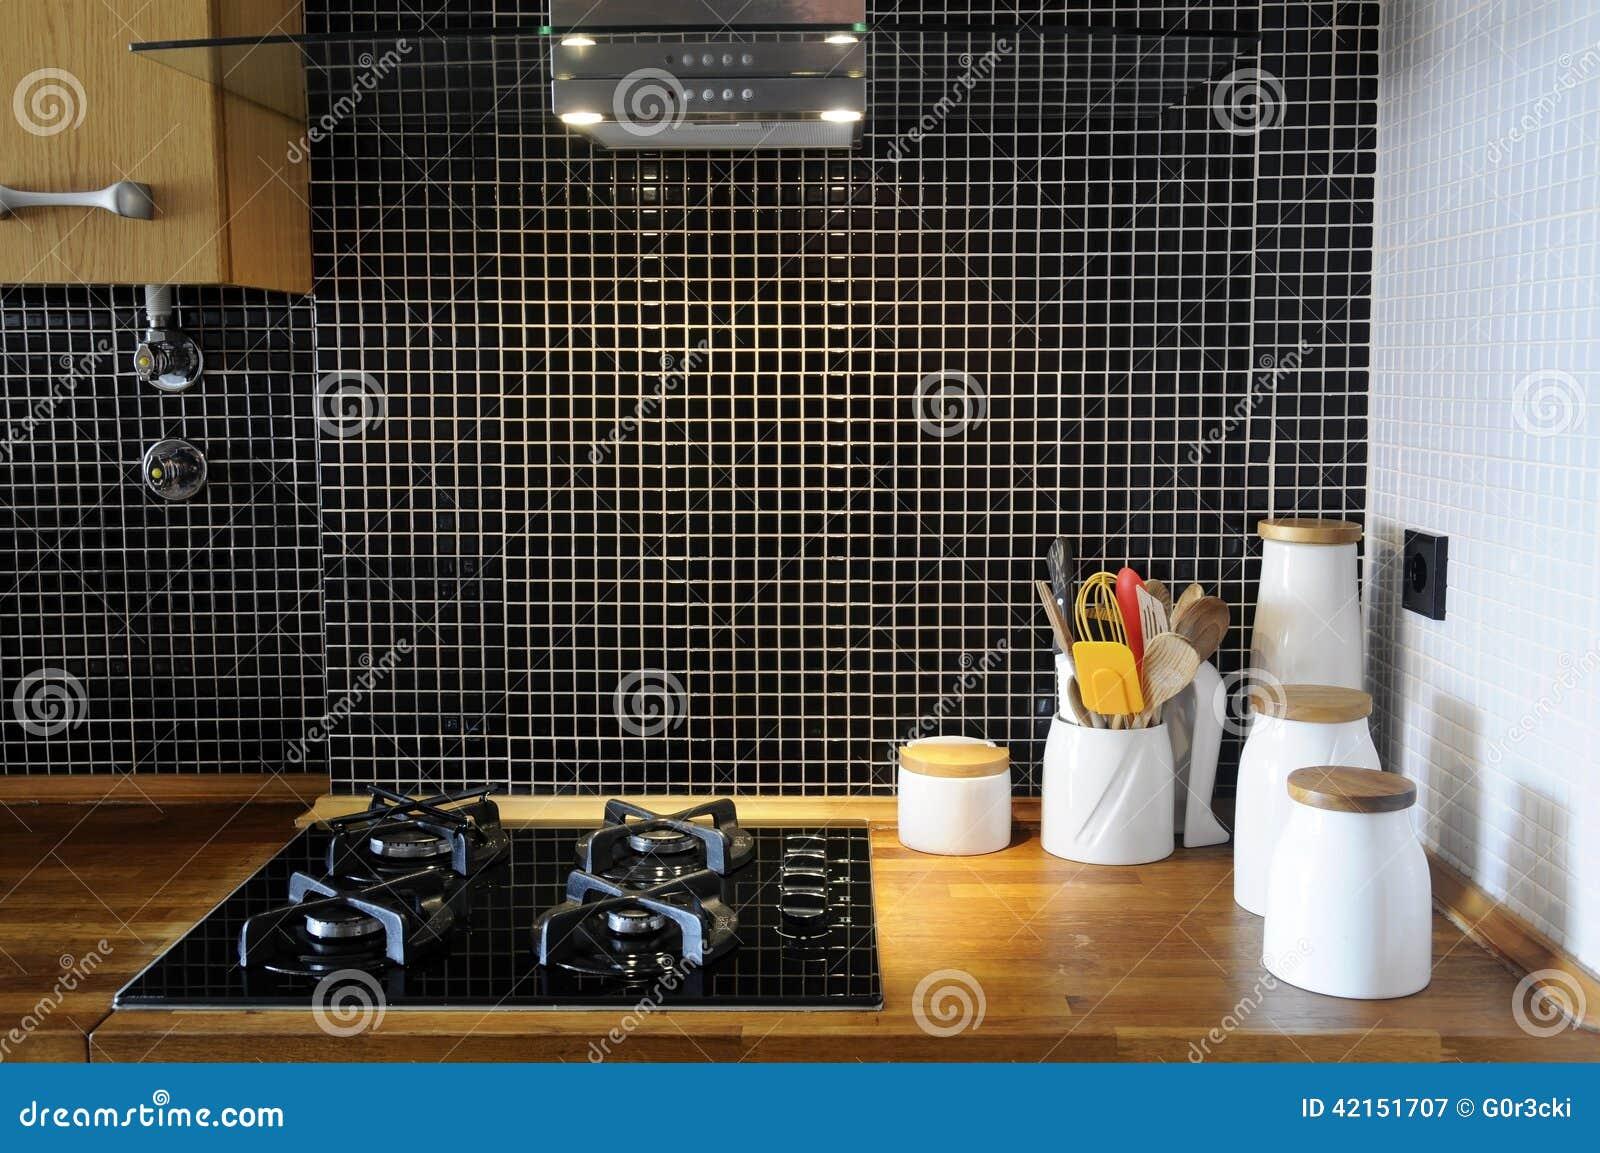 18 502 Kitchen Tiles Photos Free Royalty Free Stock Photos From Dreamstime